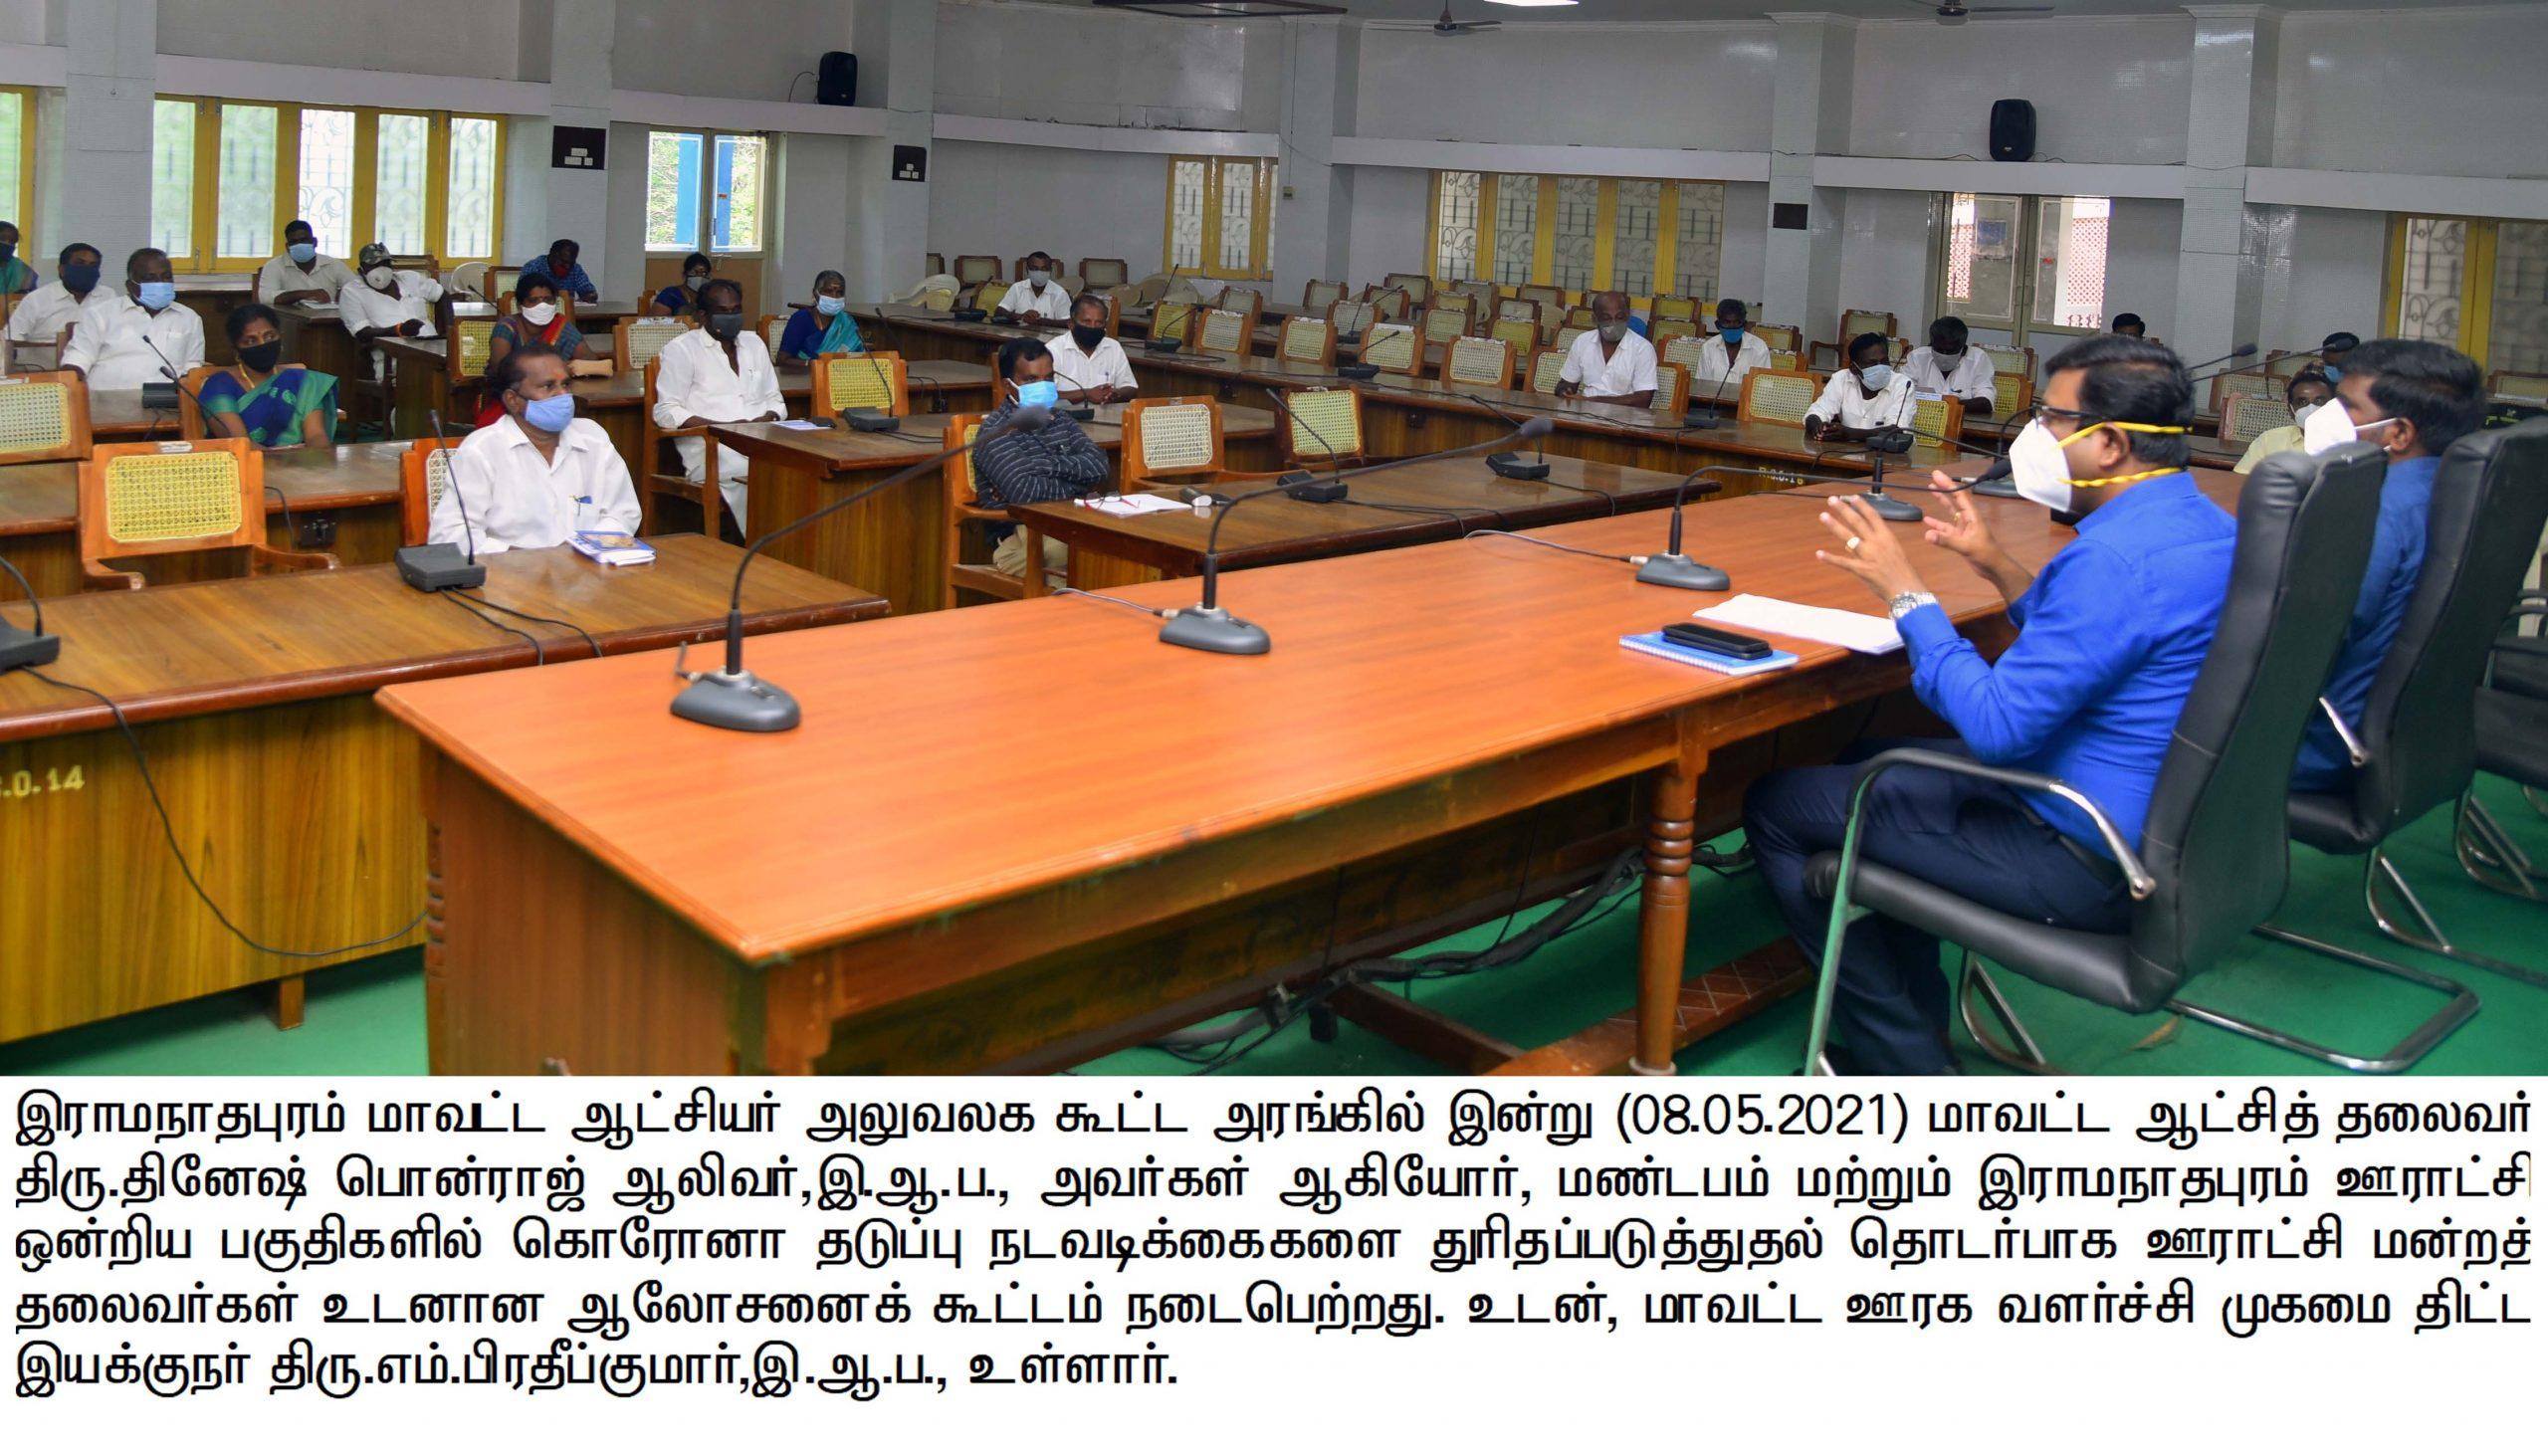 08_CORONA_COLLECTOR MEETING WITH PANCHAYAT PRESIDENTS_08/05/2021